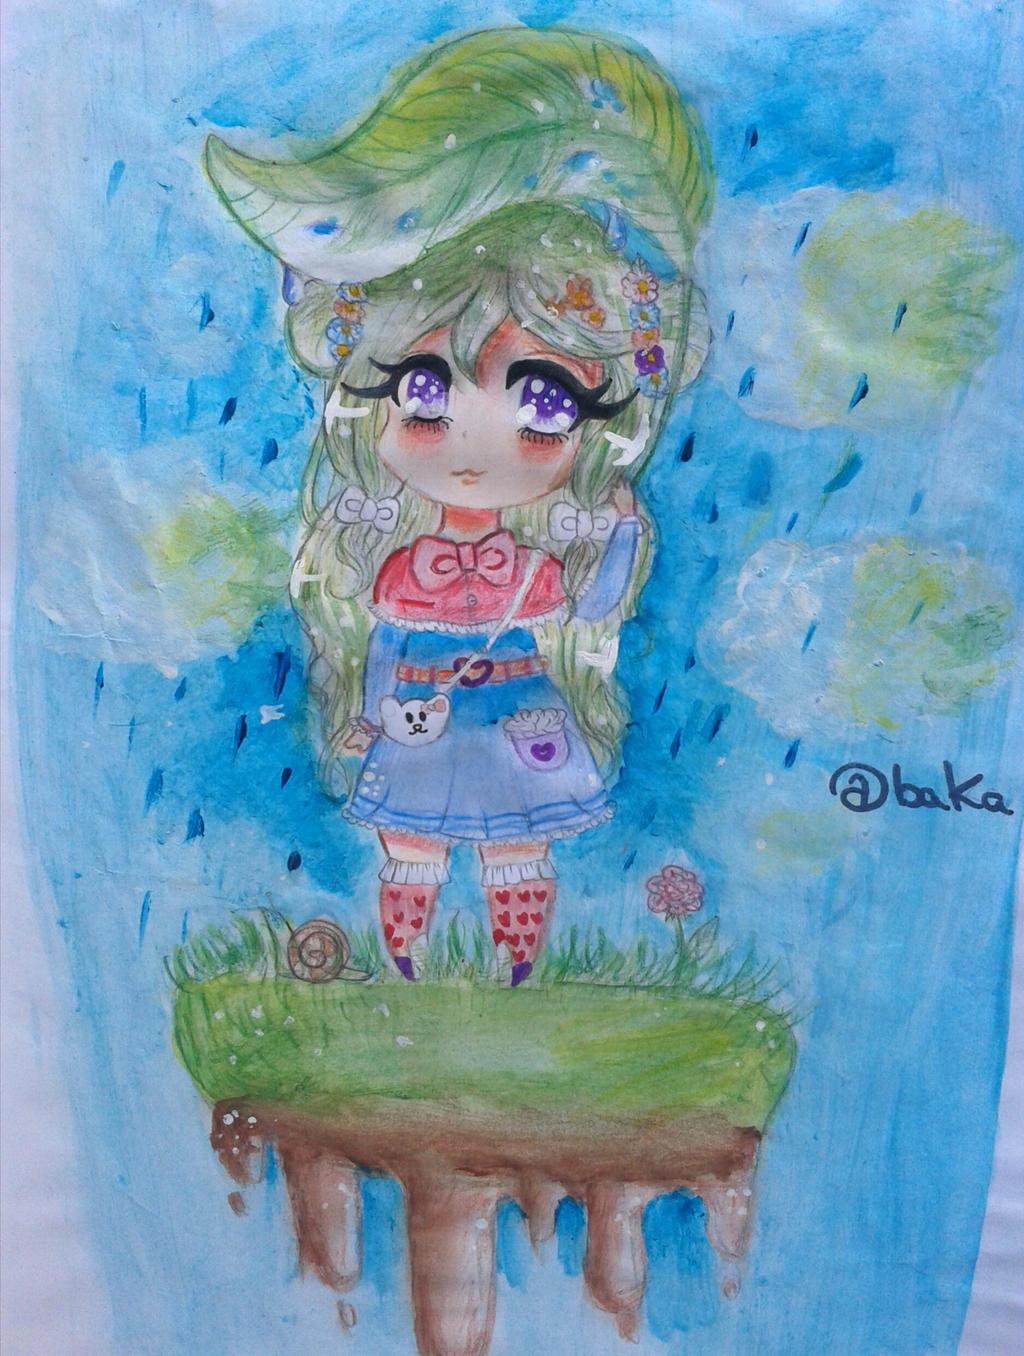 Rainy Days  by bakagummi